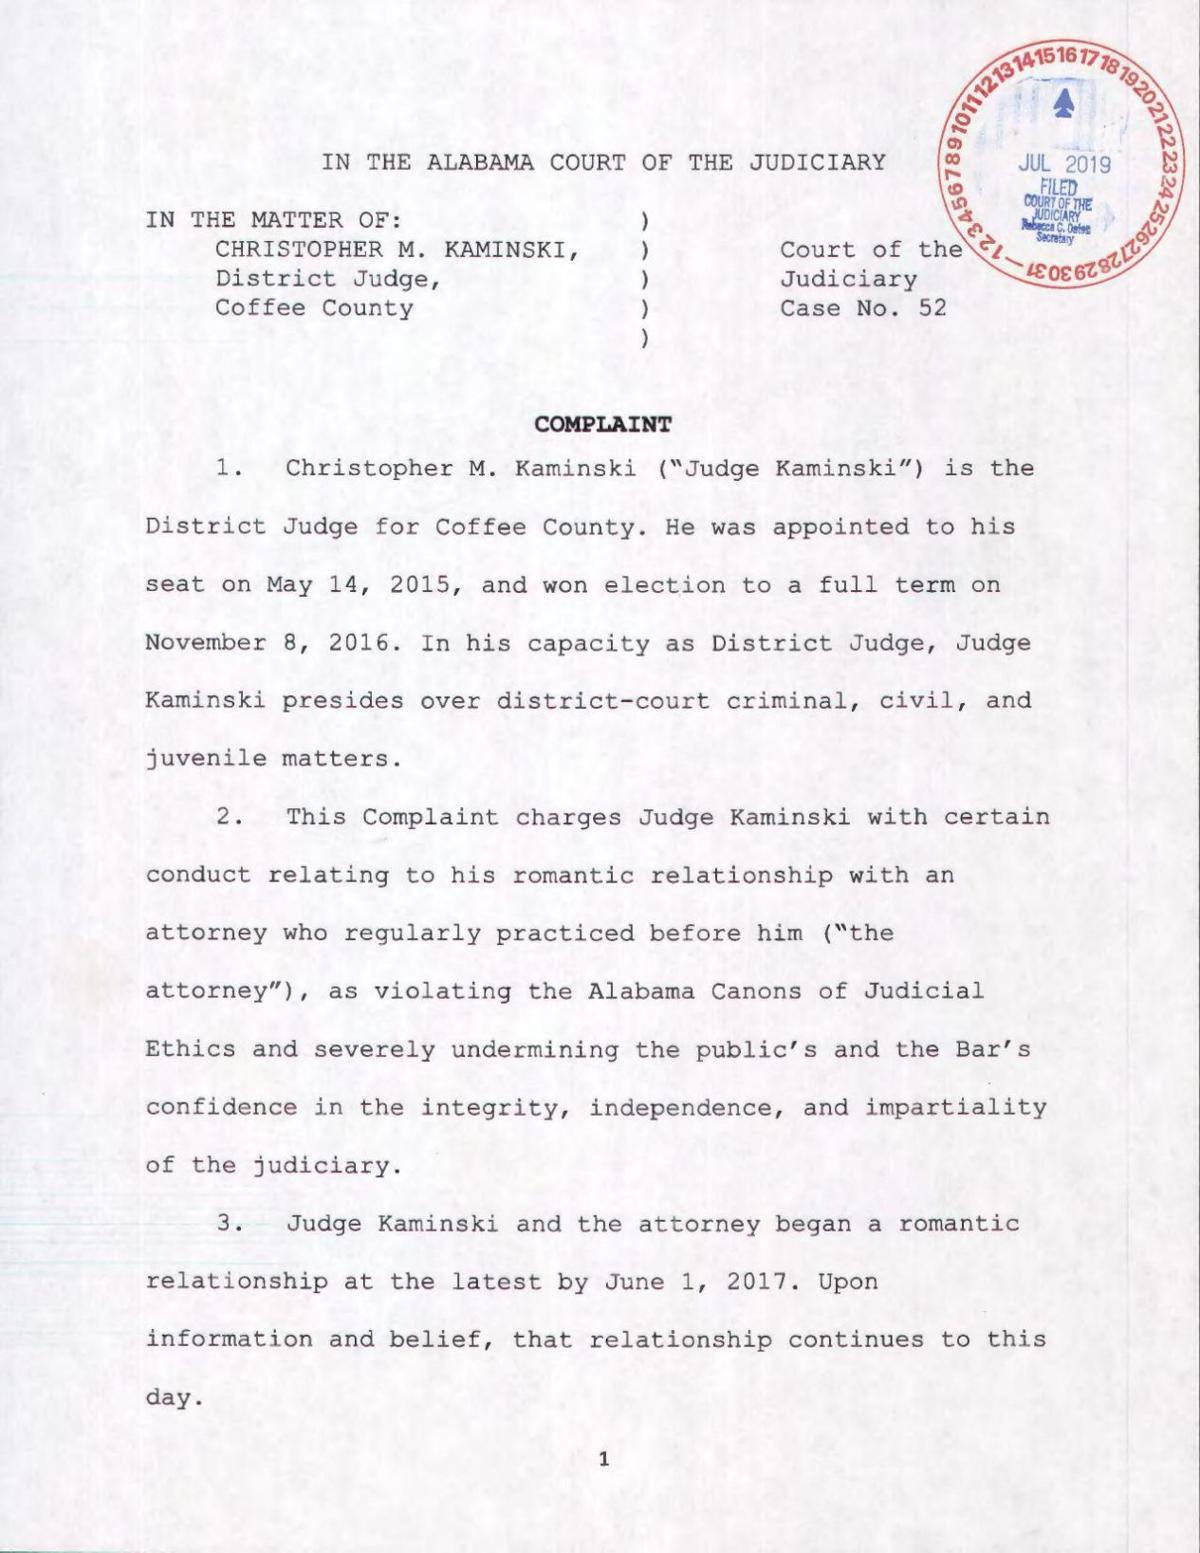 Complaint against Judge Chris Kaminski